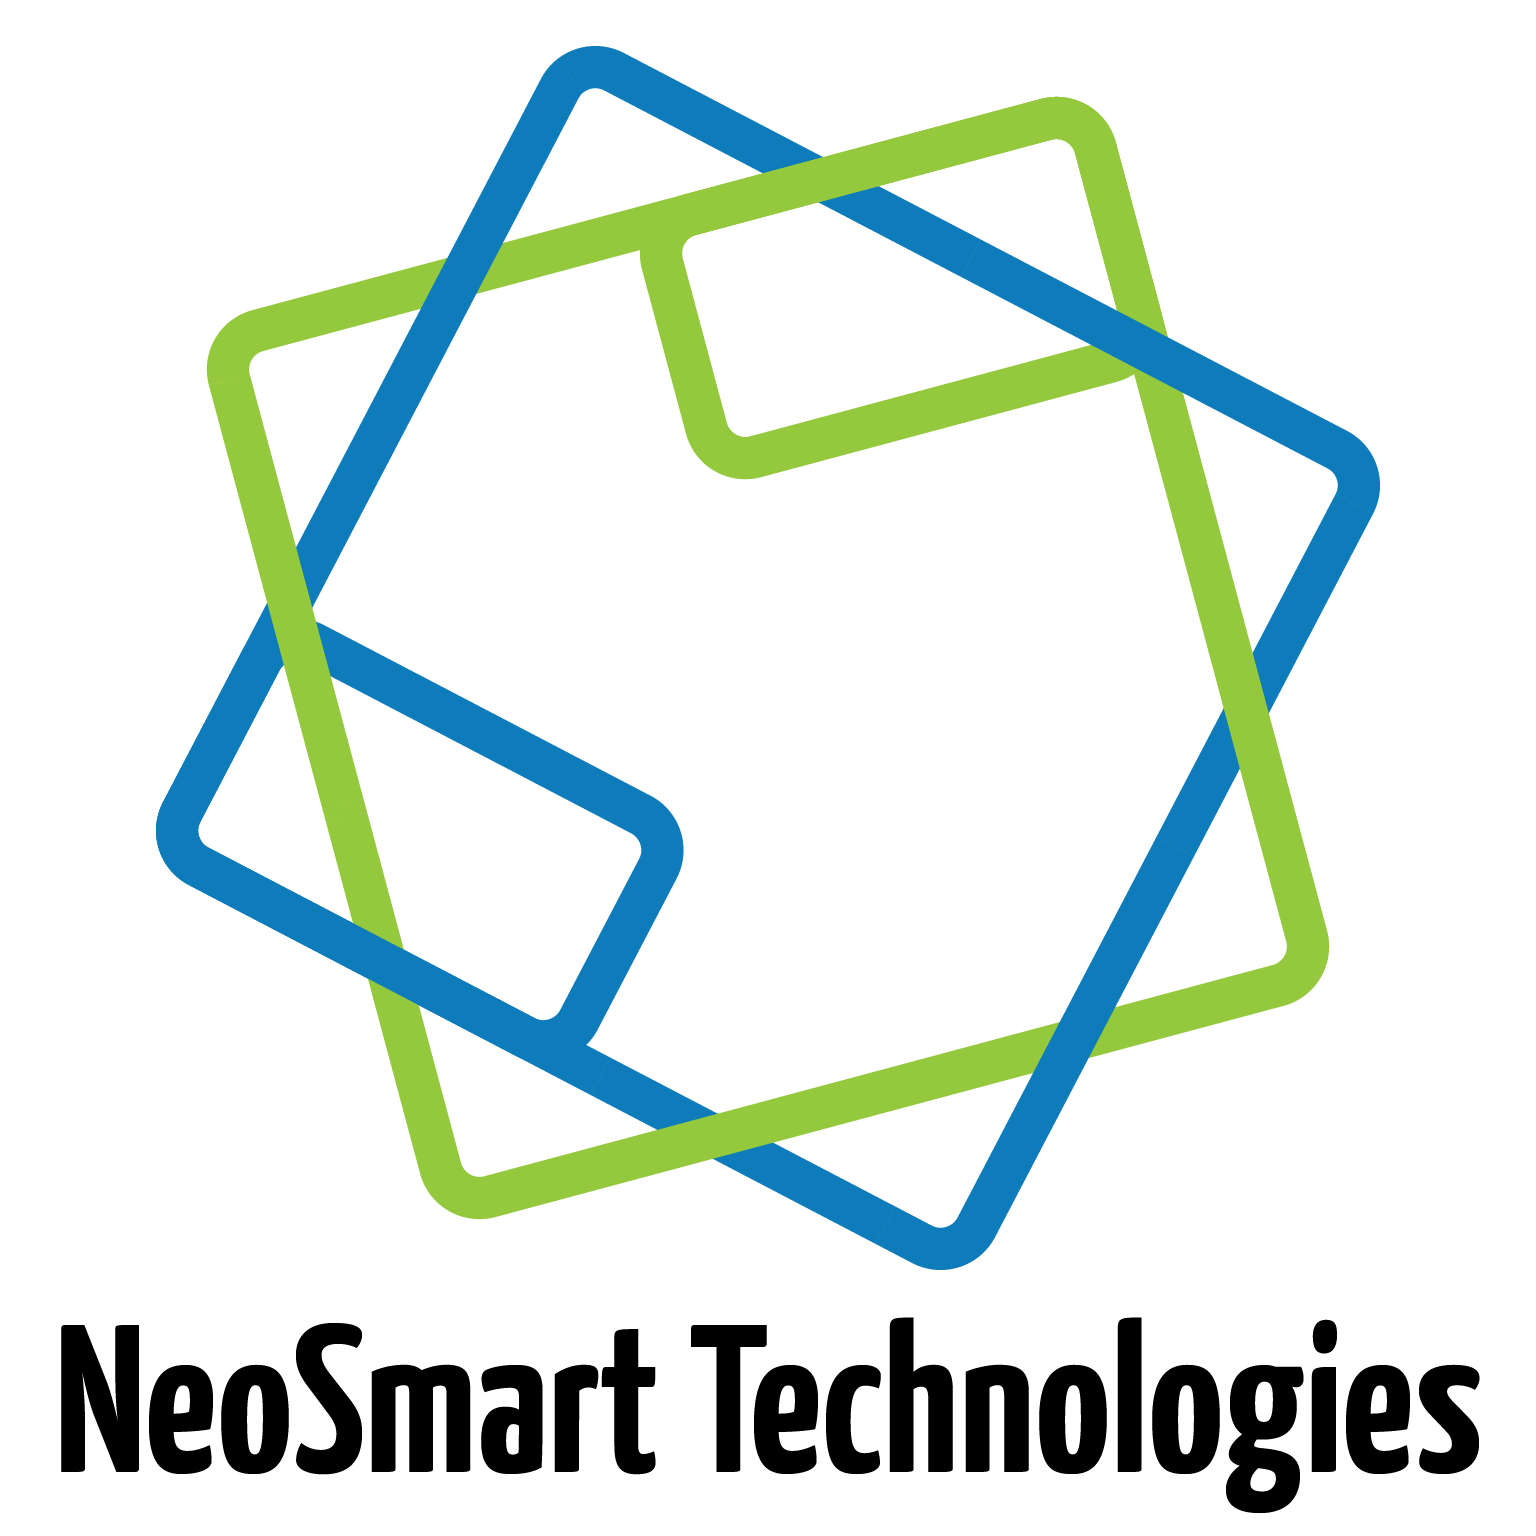 NeoSmart Technologies